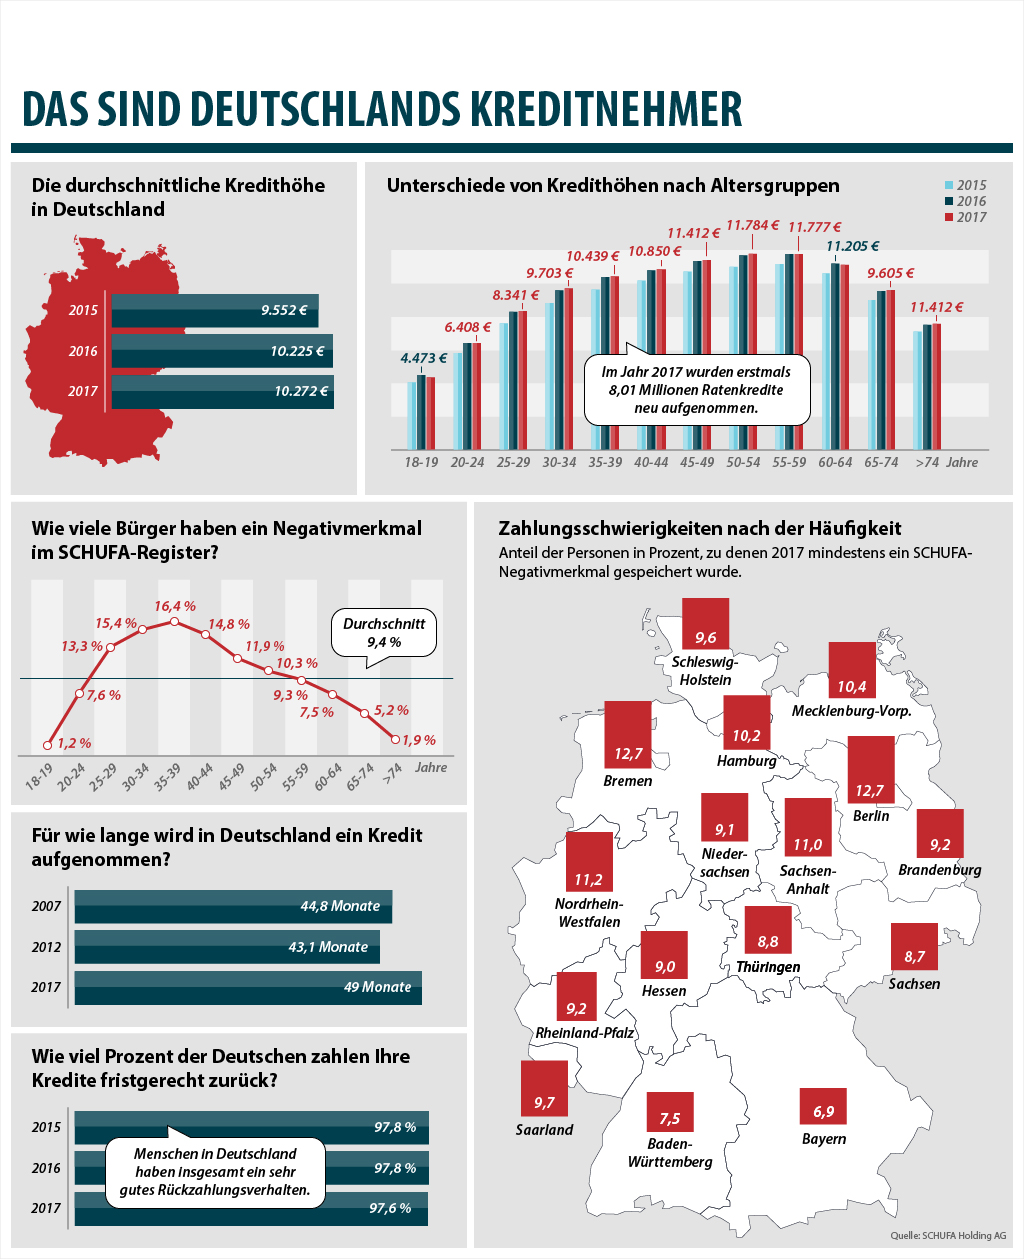 Infografik: deutsche Kreditnehmer